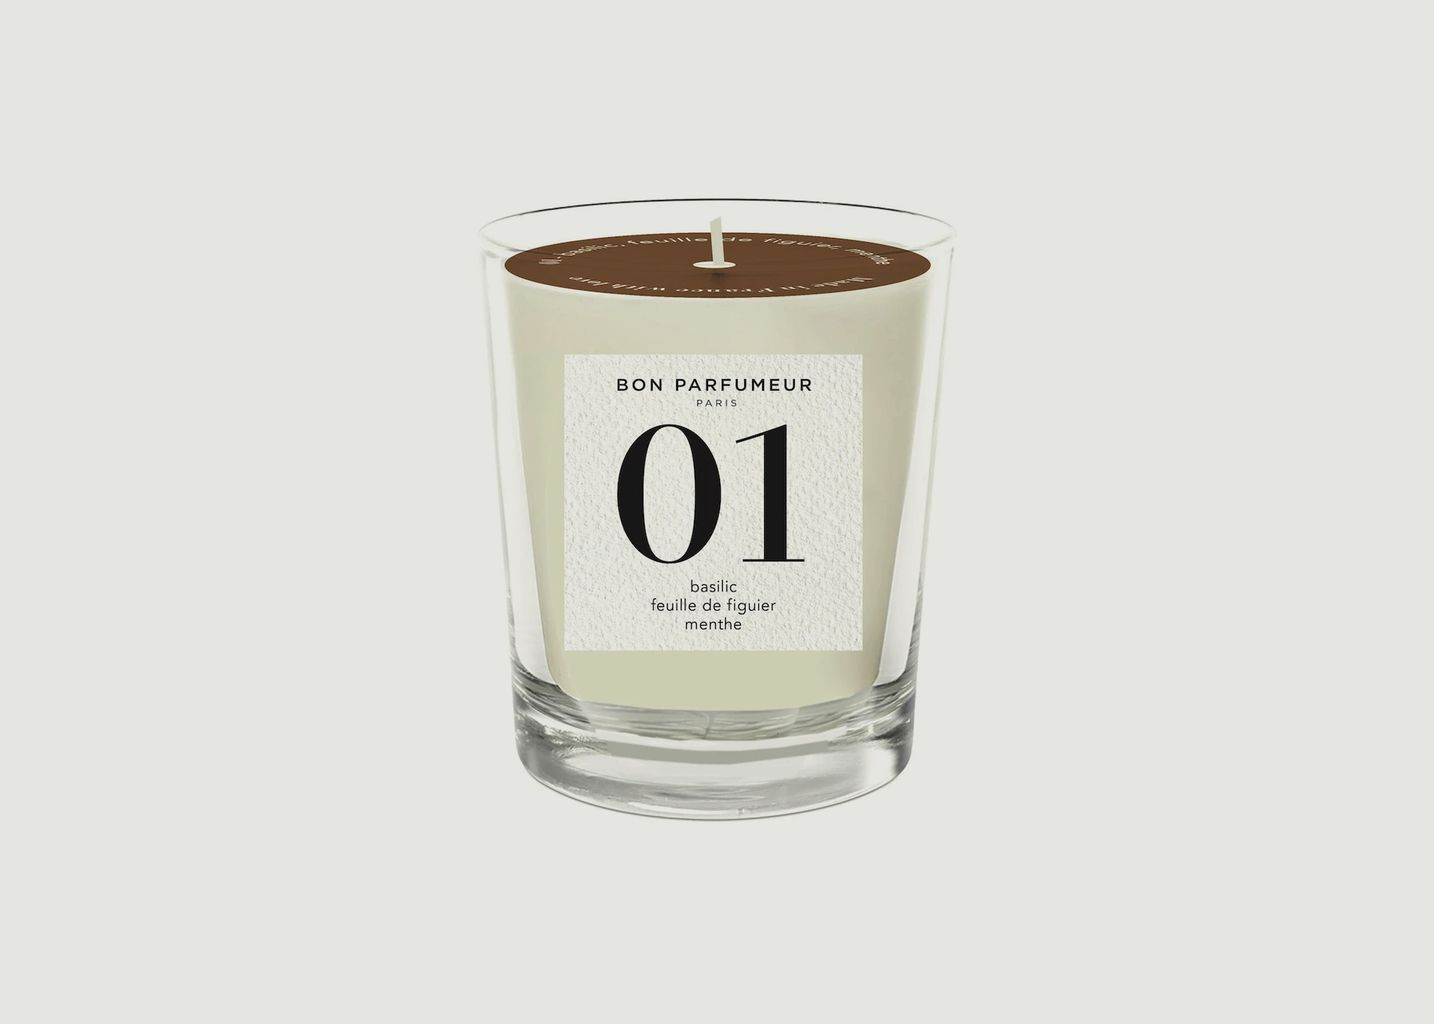 Bougie N°1 - Bon Parfumeur